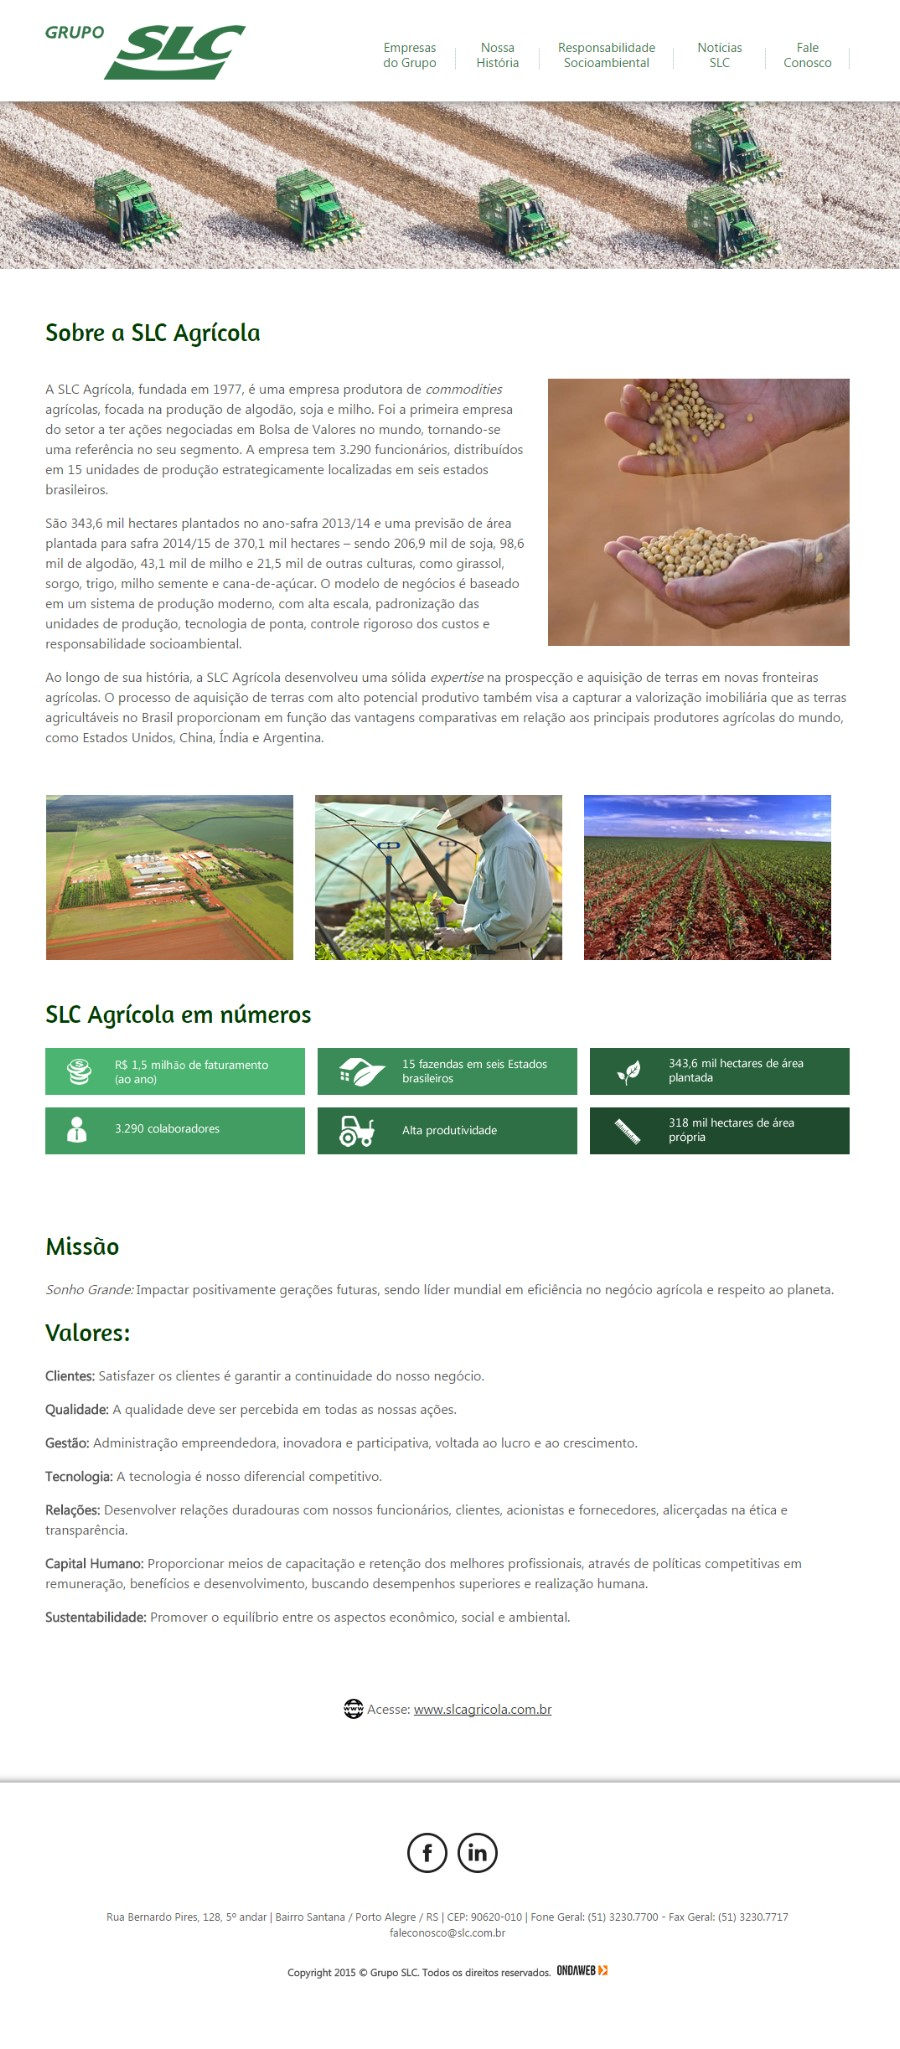 SLC_AGRICOLA